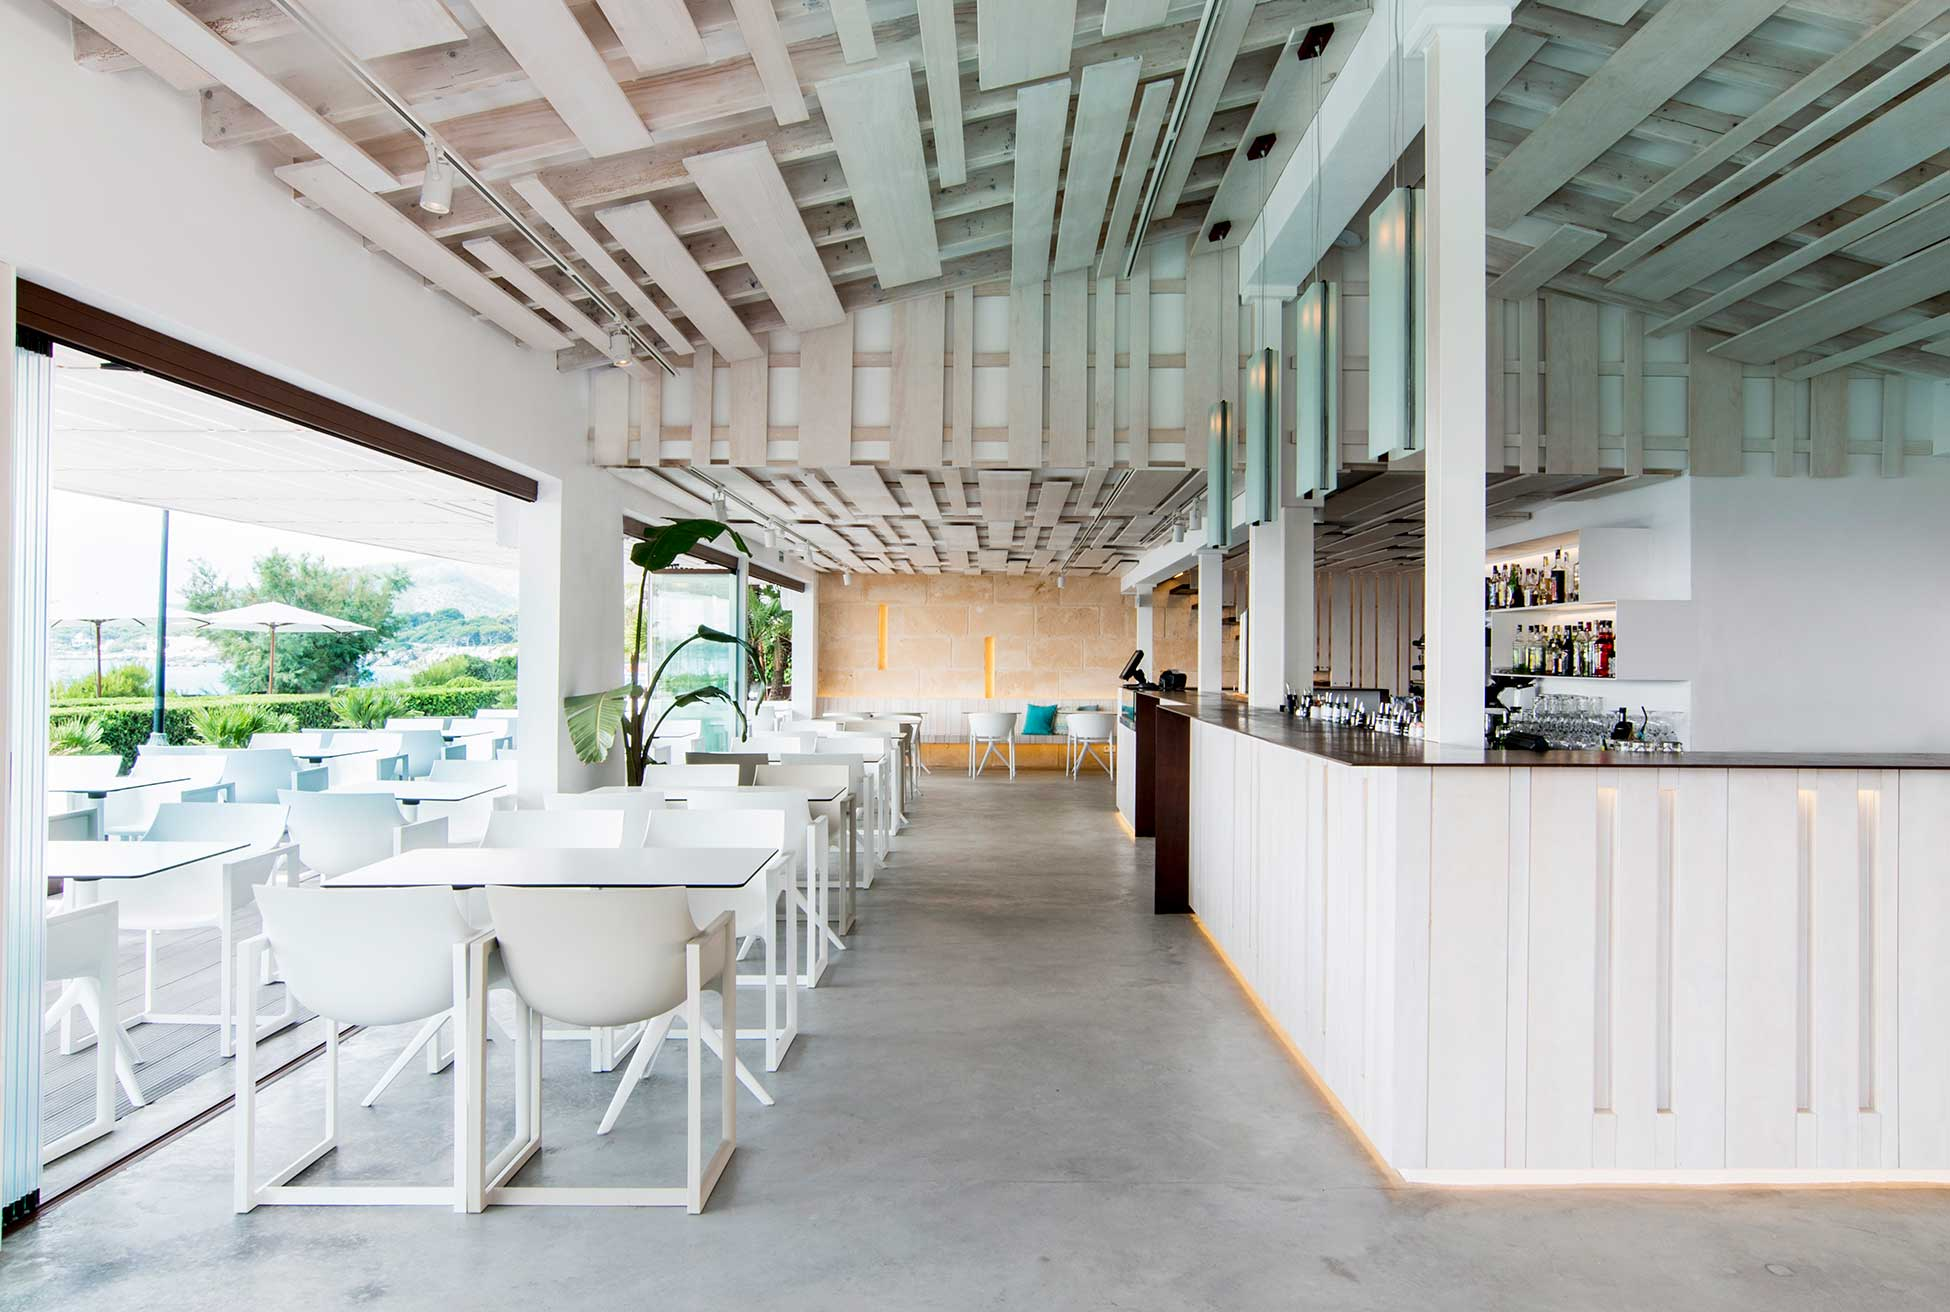 Euforia Tapas Restaurant